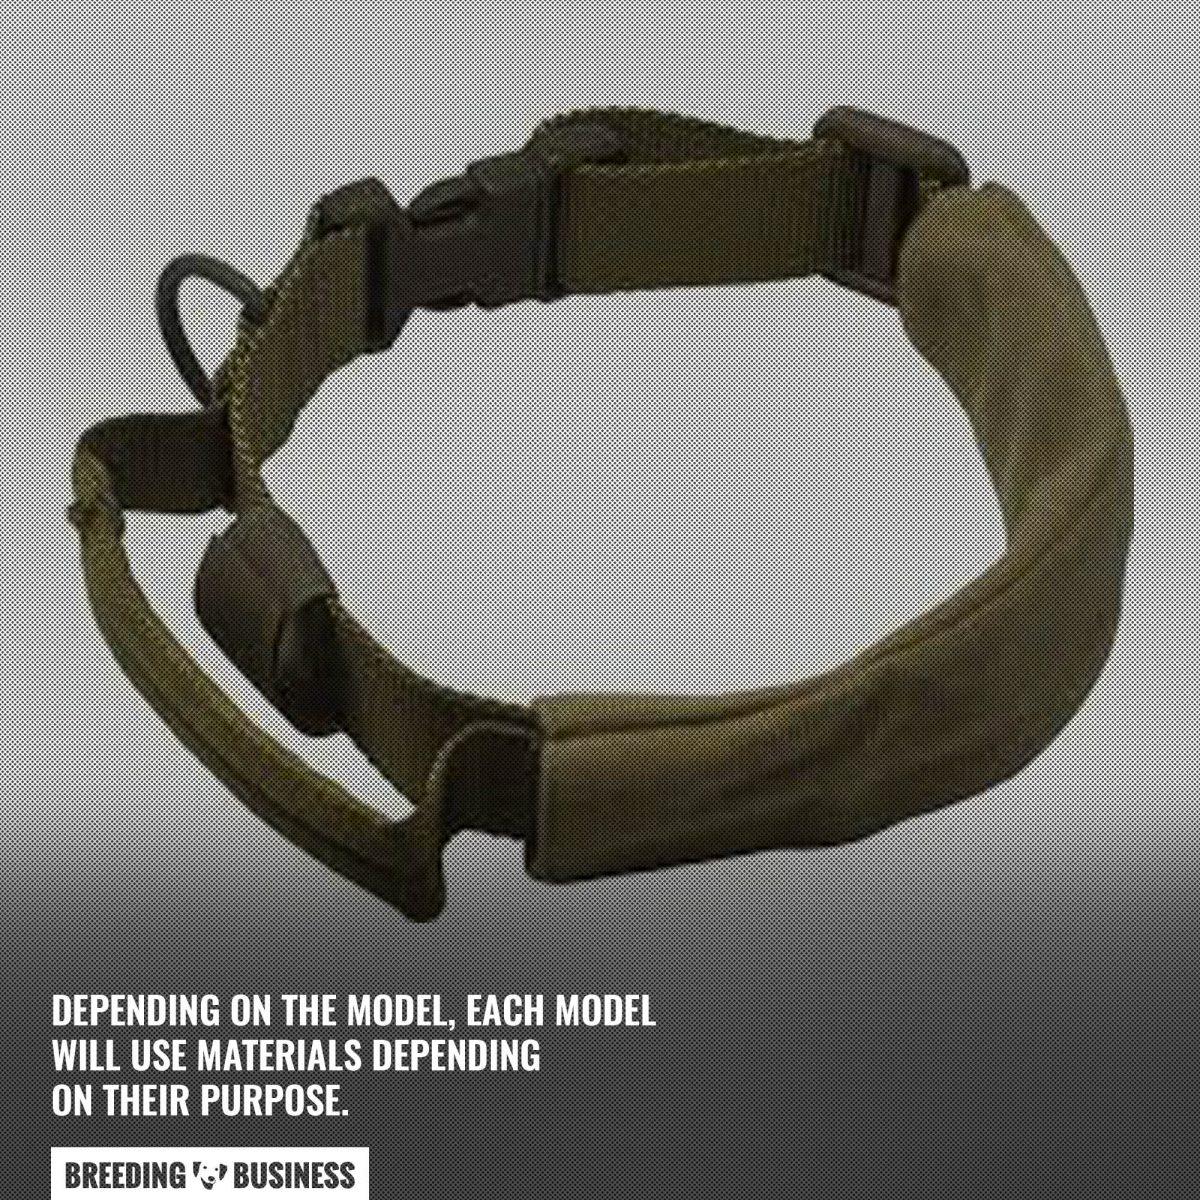 model of tactical dog collar